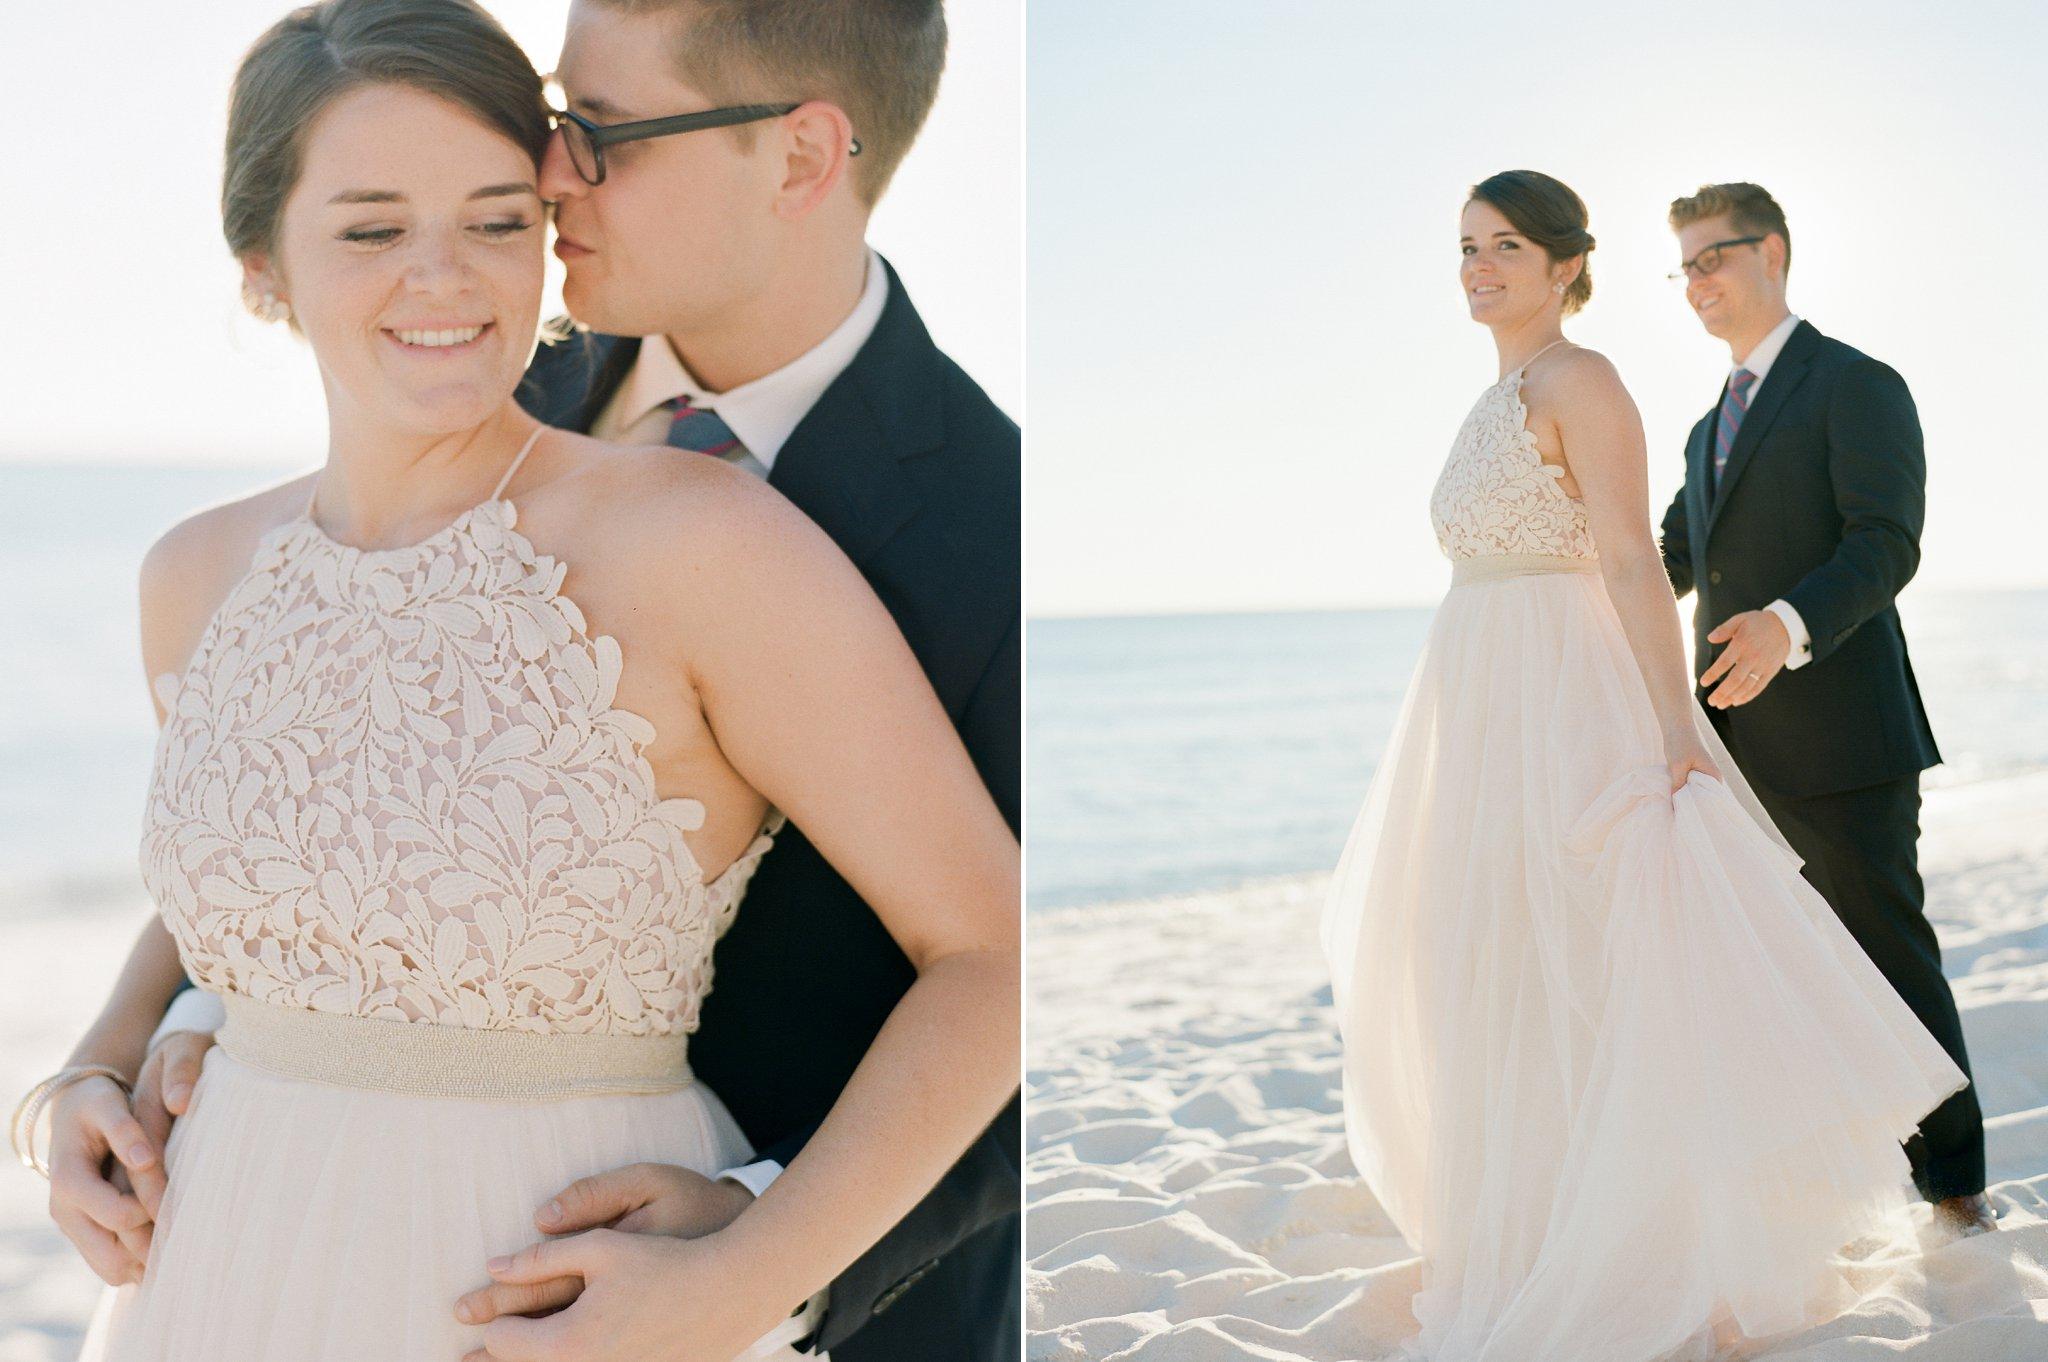 inlet beach wedding 30a wedding inlet beach wedding photographer shannon griffin photography_0040.jpg